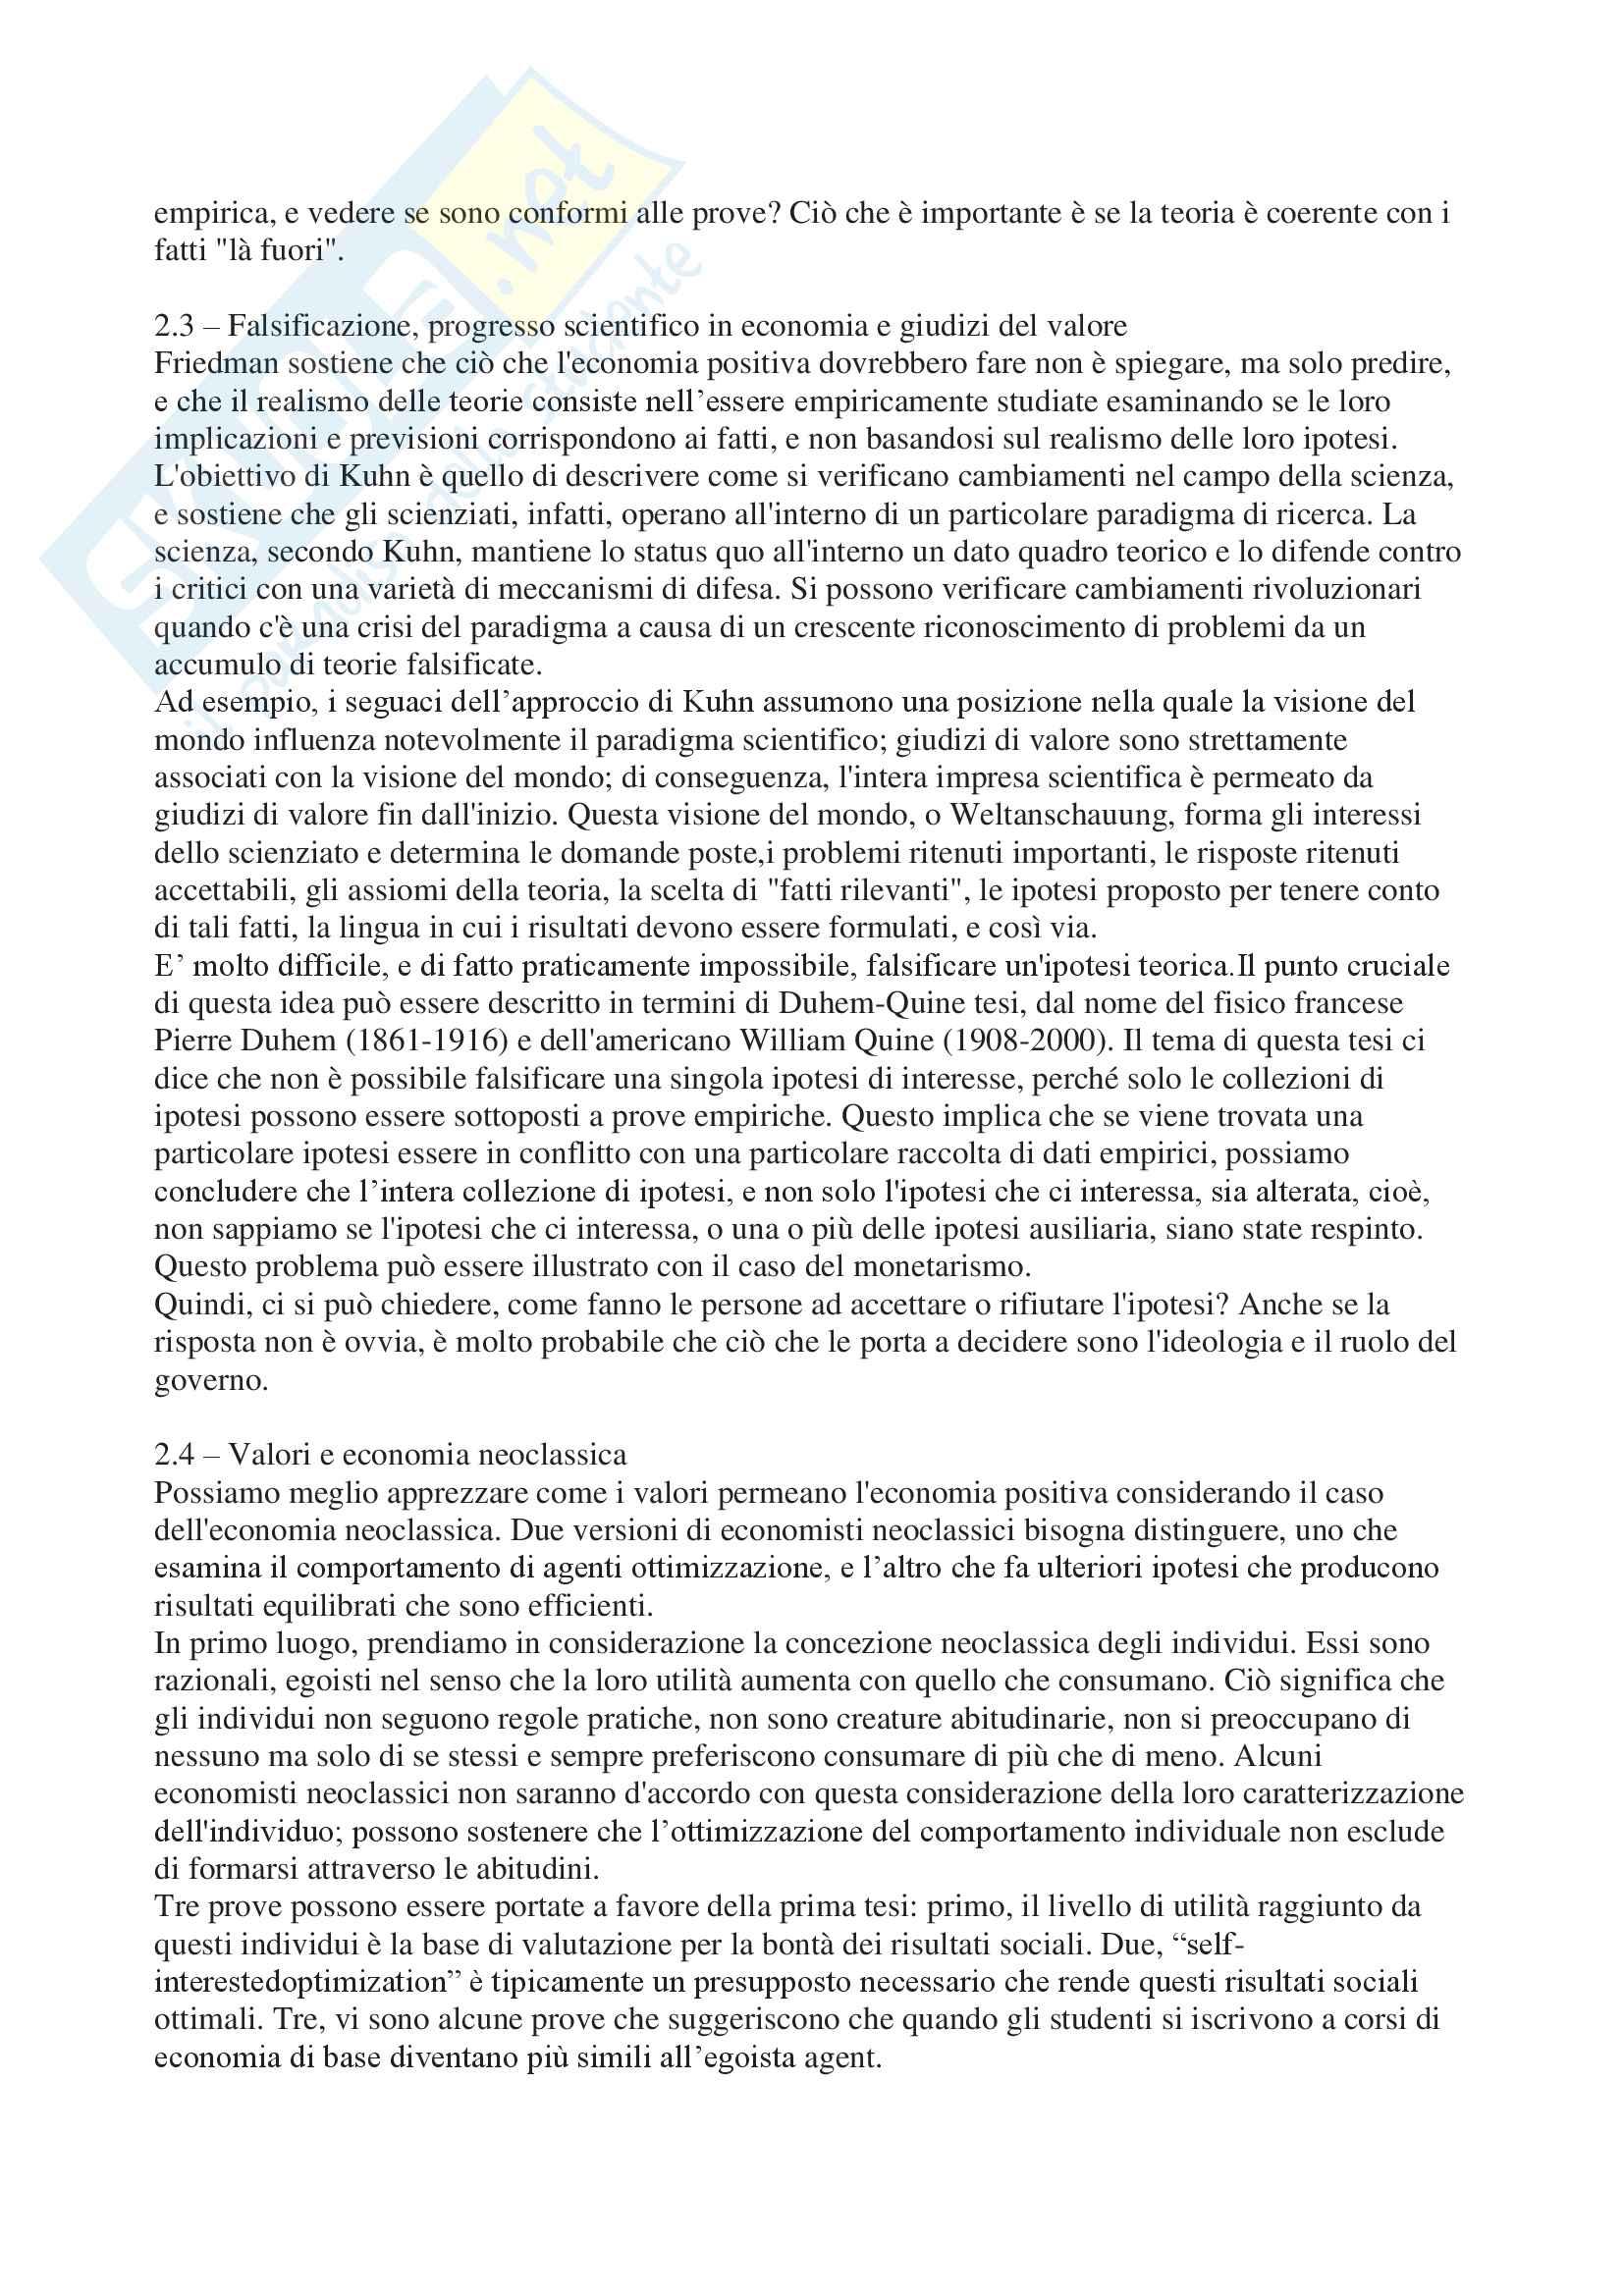 Modulo economico (De Muro) Pag. 6